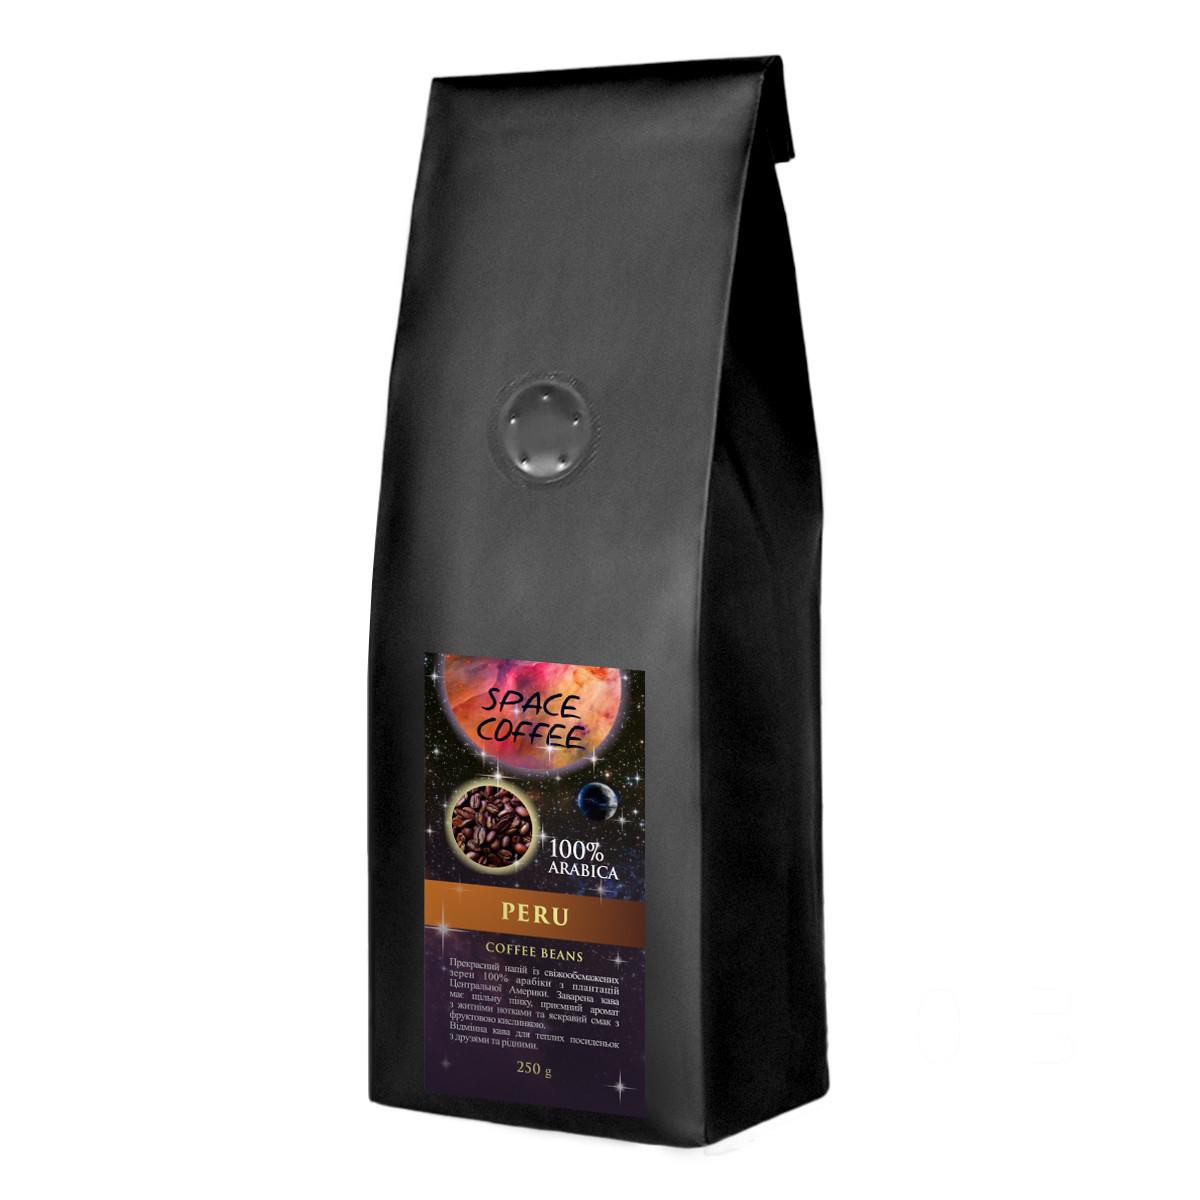 Свіжообсмажена кава в зернах Space Coffee Peru 100% арабіка 250 грам